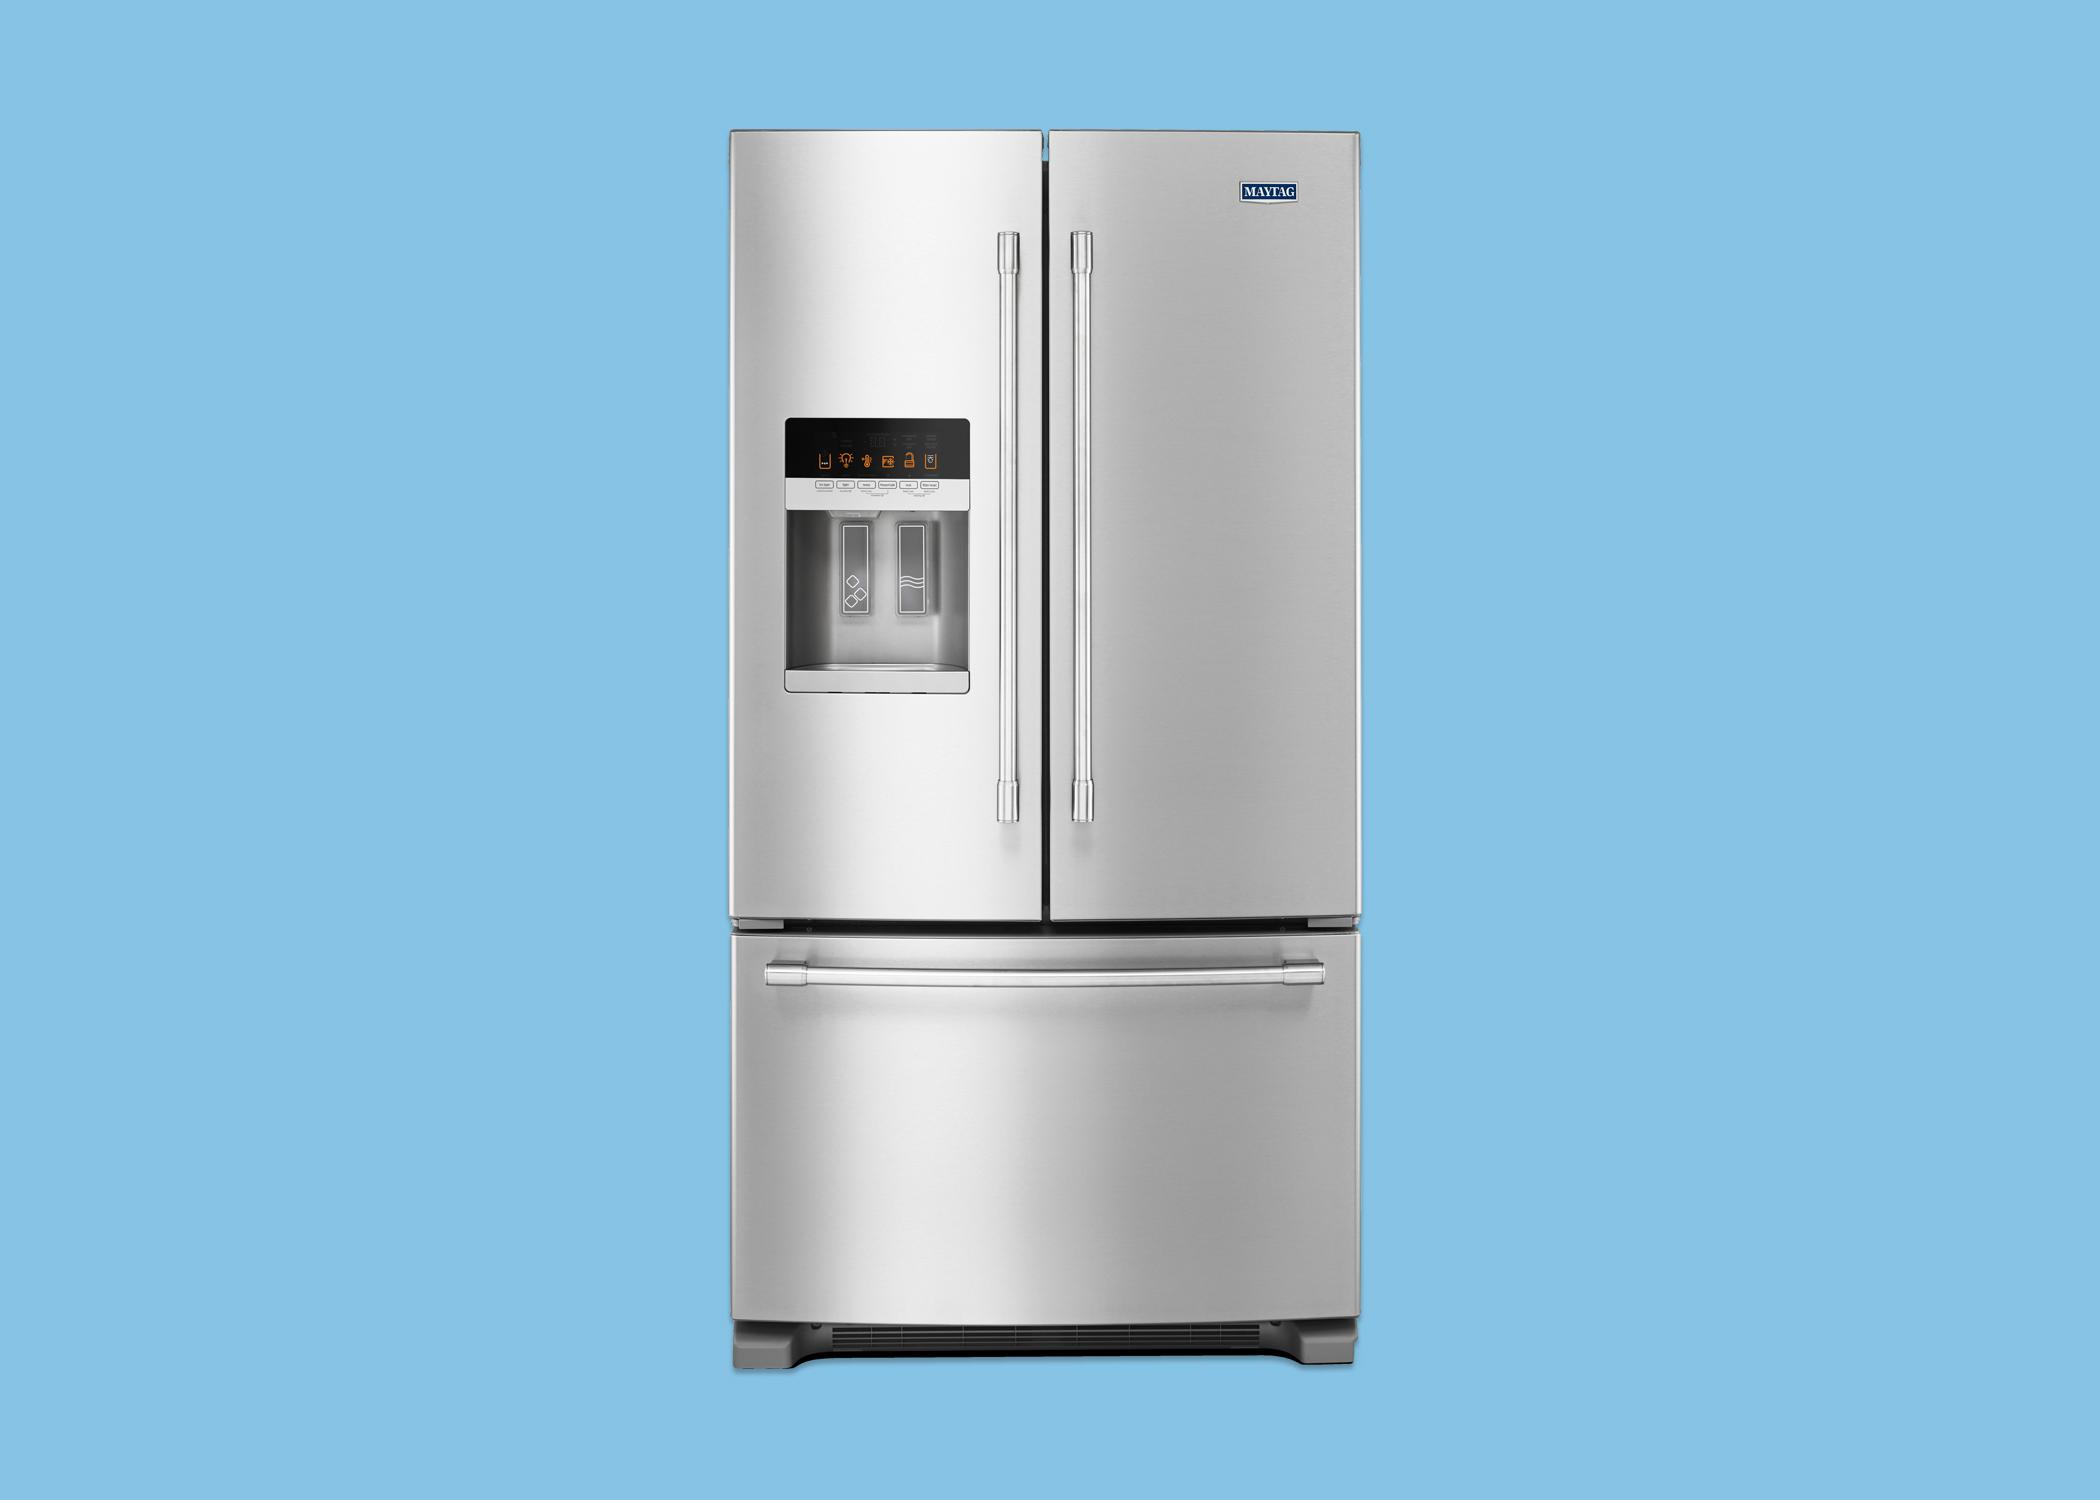 170503-maytag-refrigerator